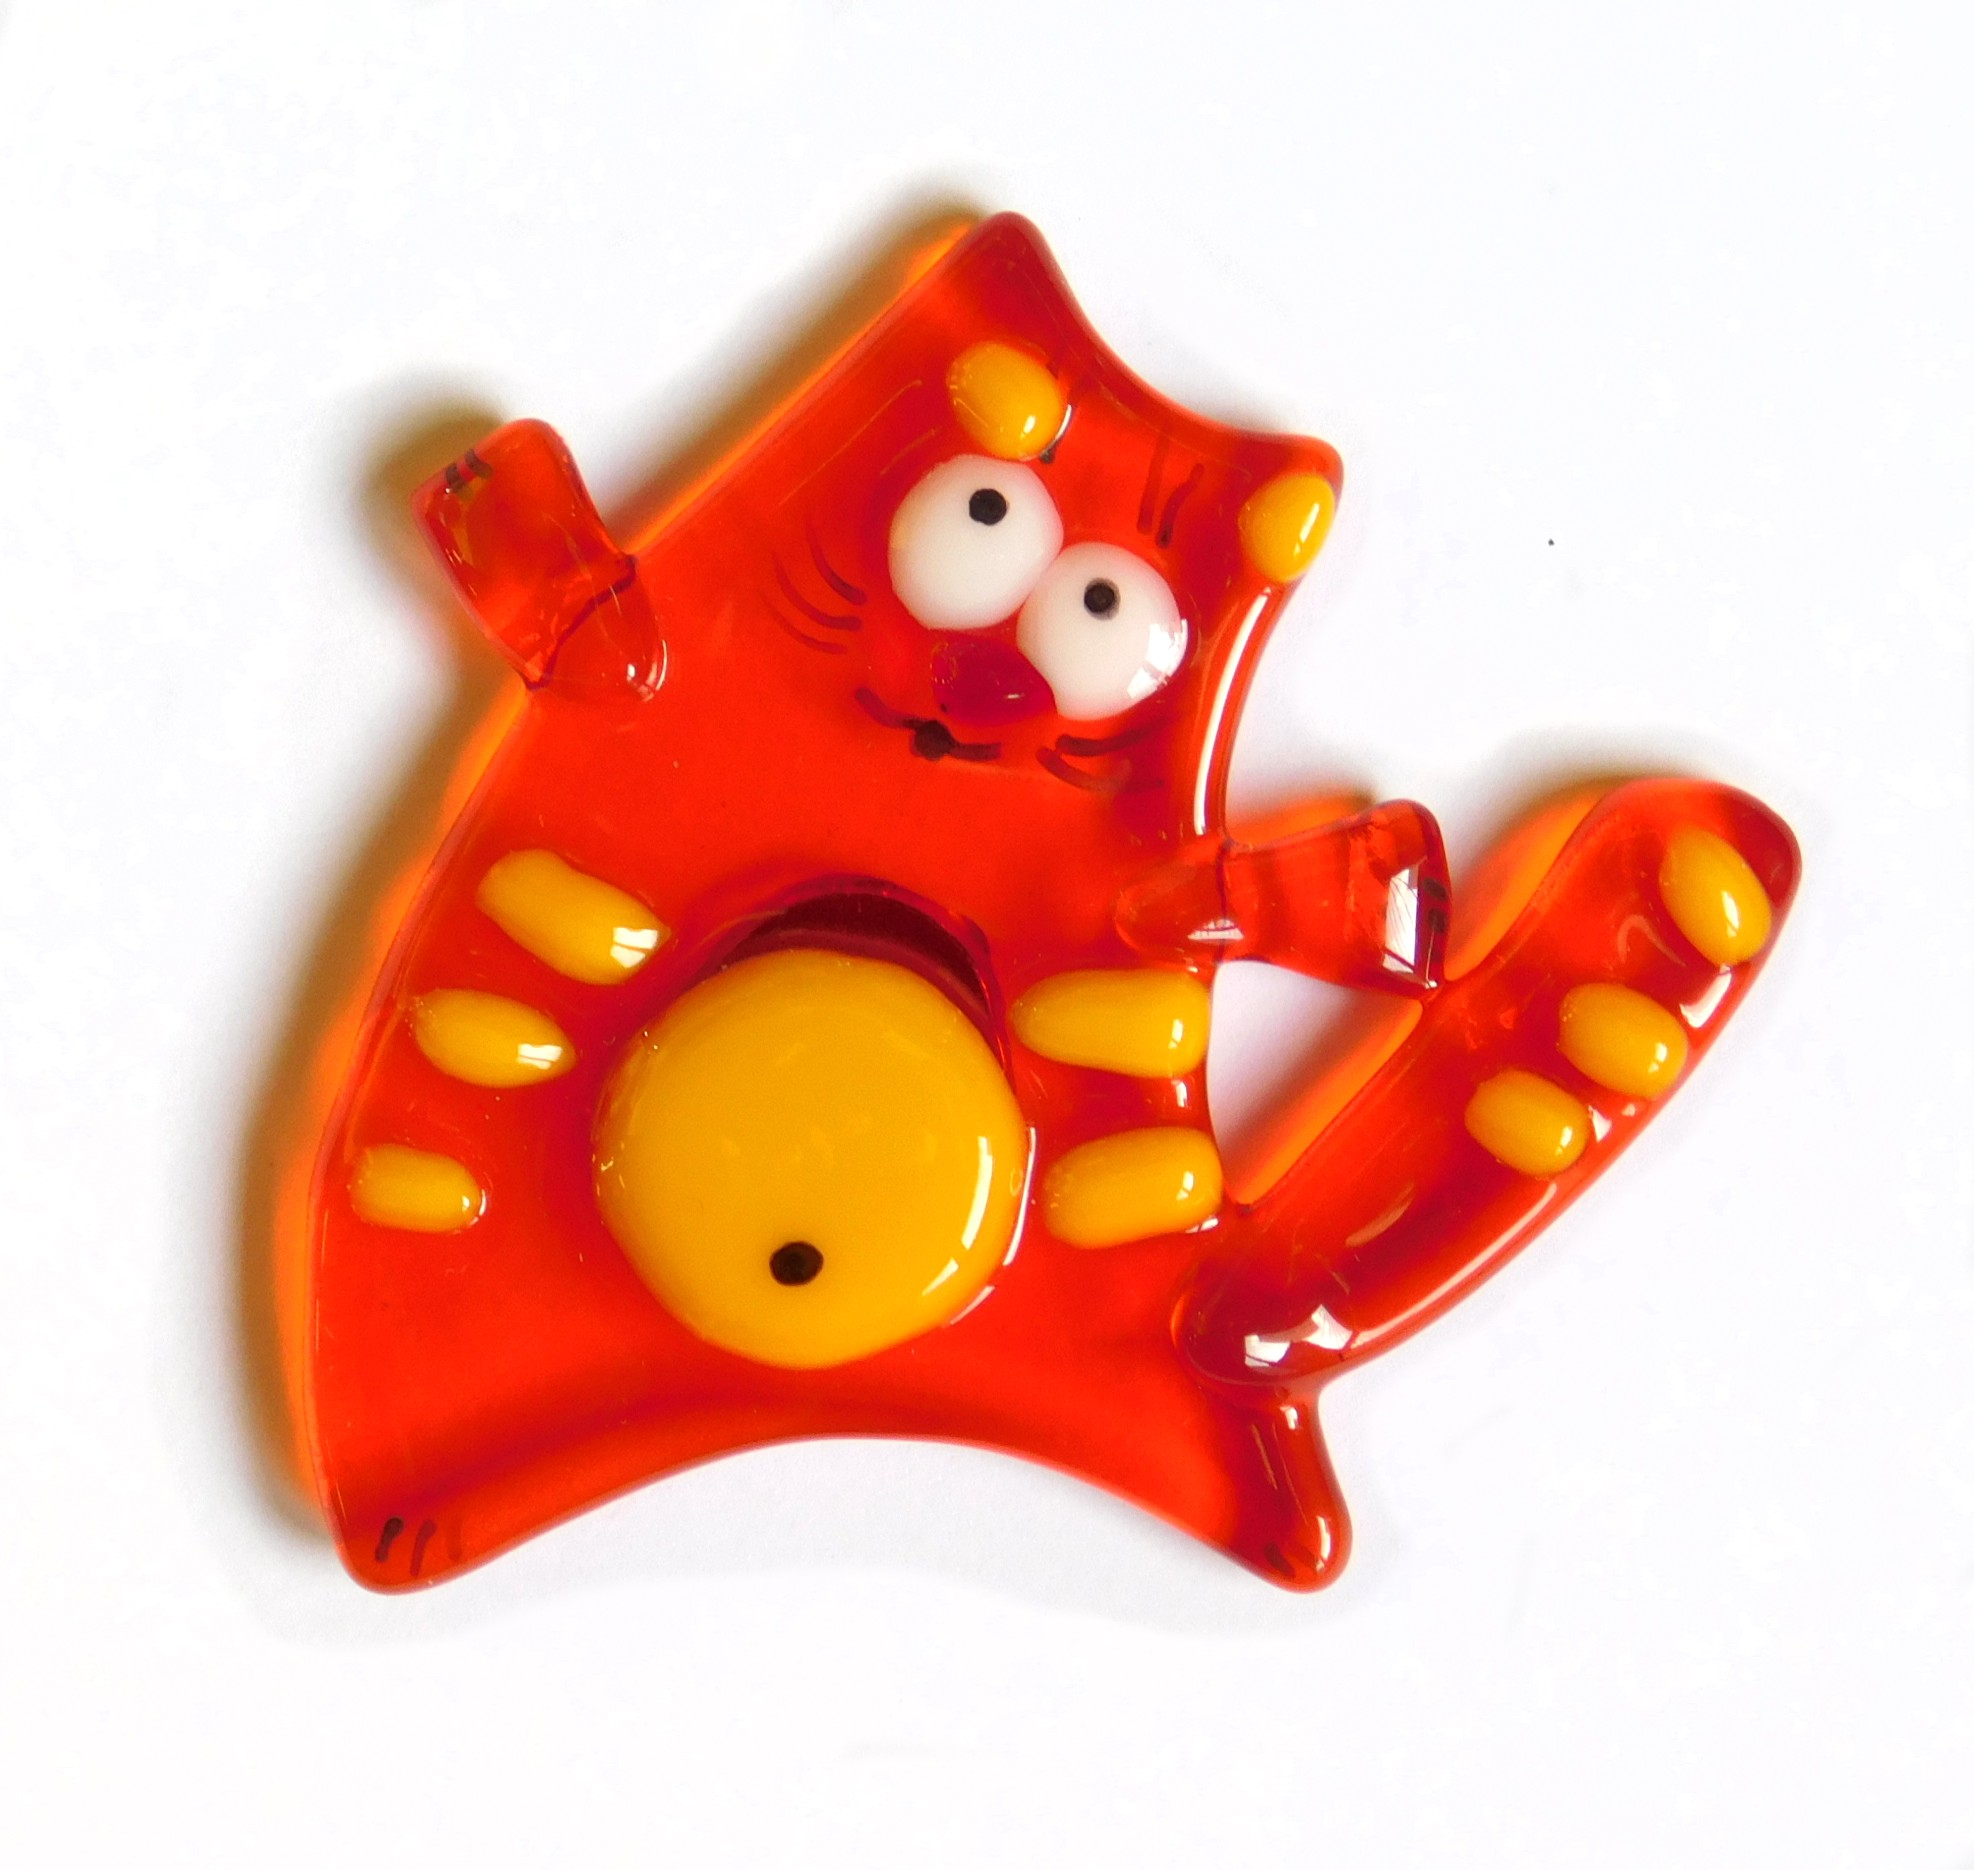 magnes kot pomarańczowy